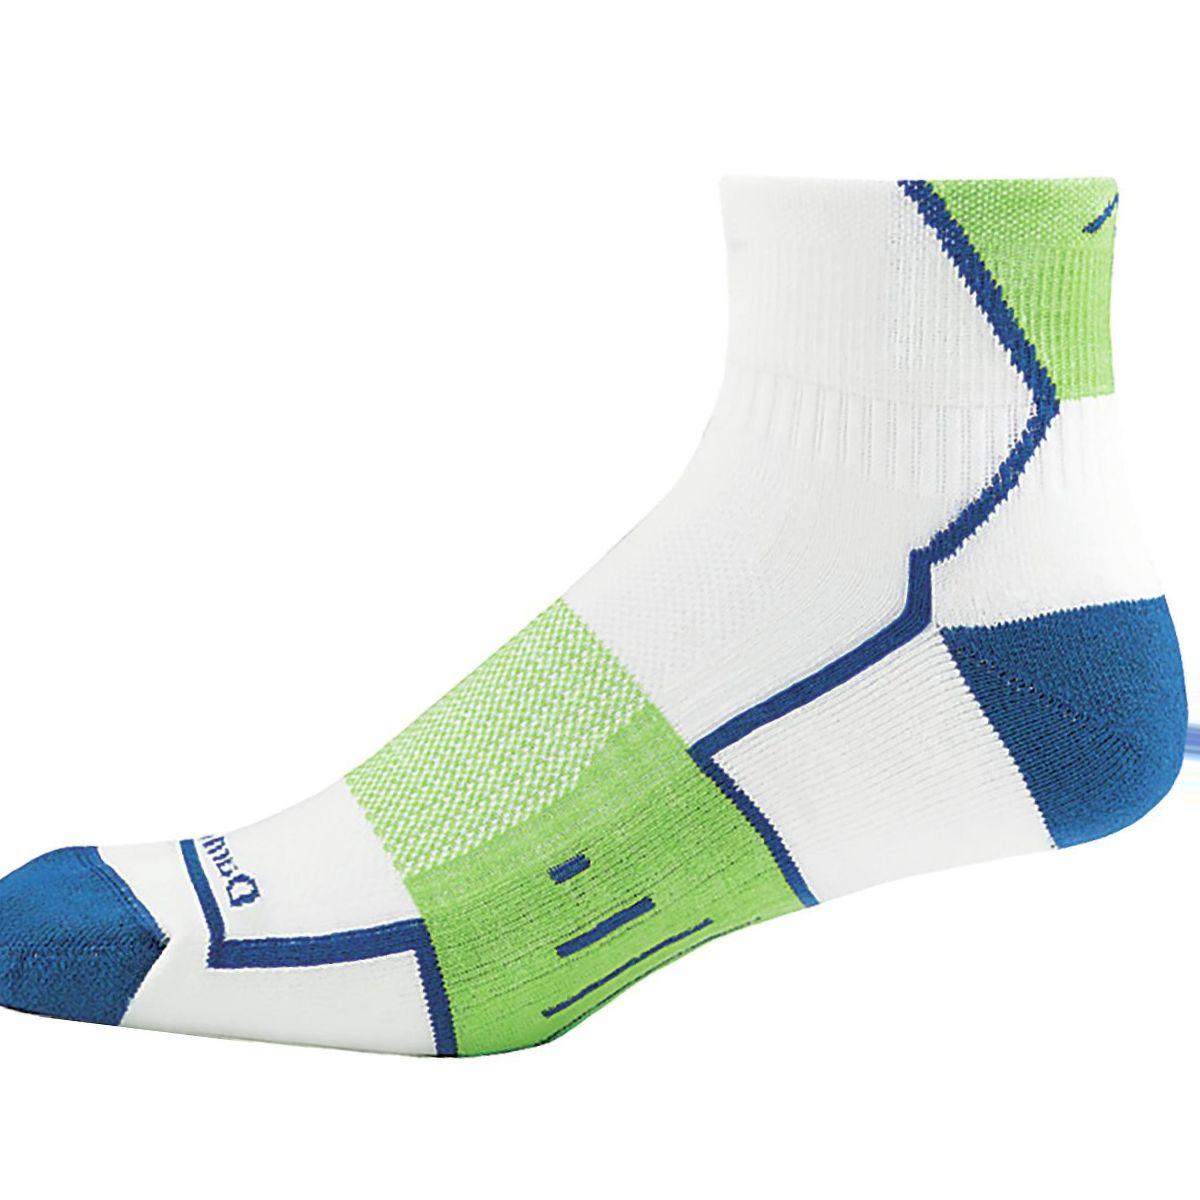 Darn Tough Grit 1/4 Light Cushion Sock - Men's